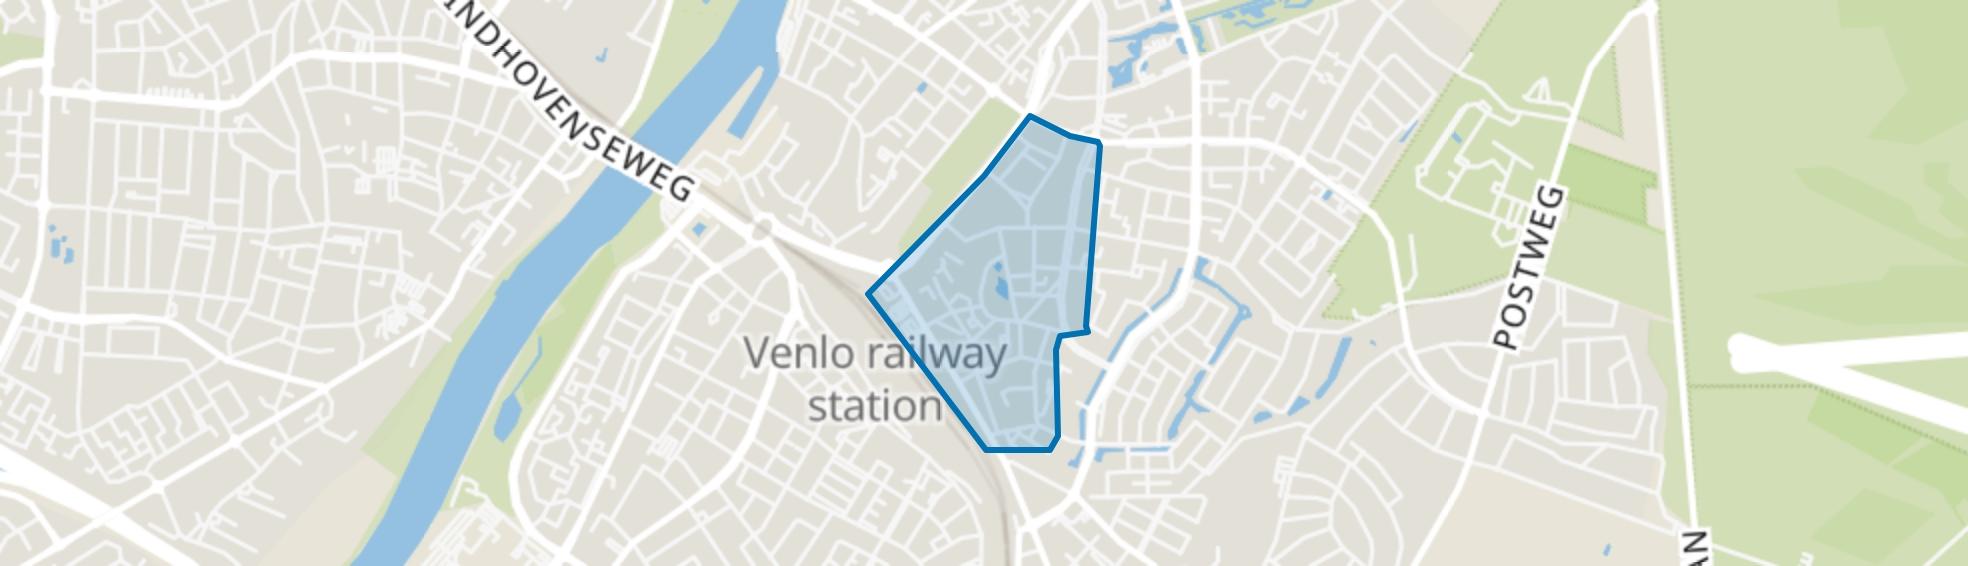 Hogekamp, Venlo map